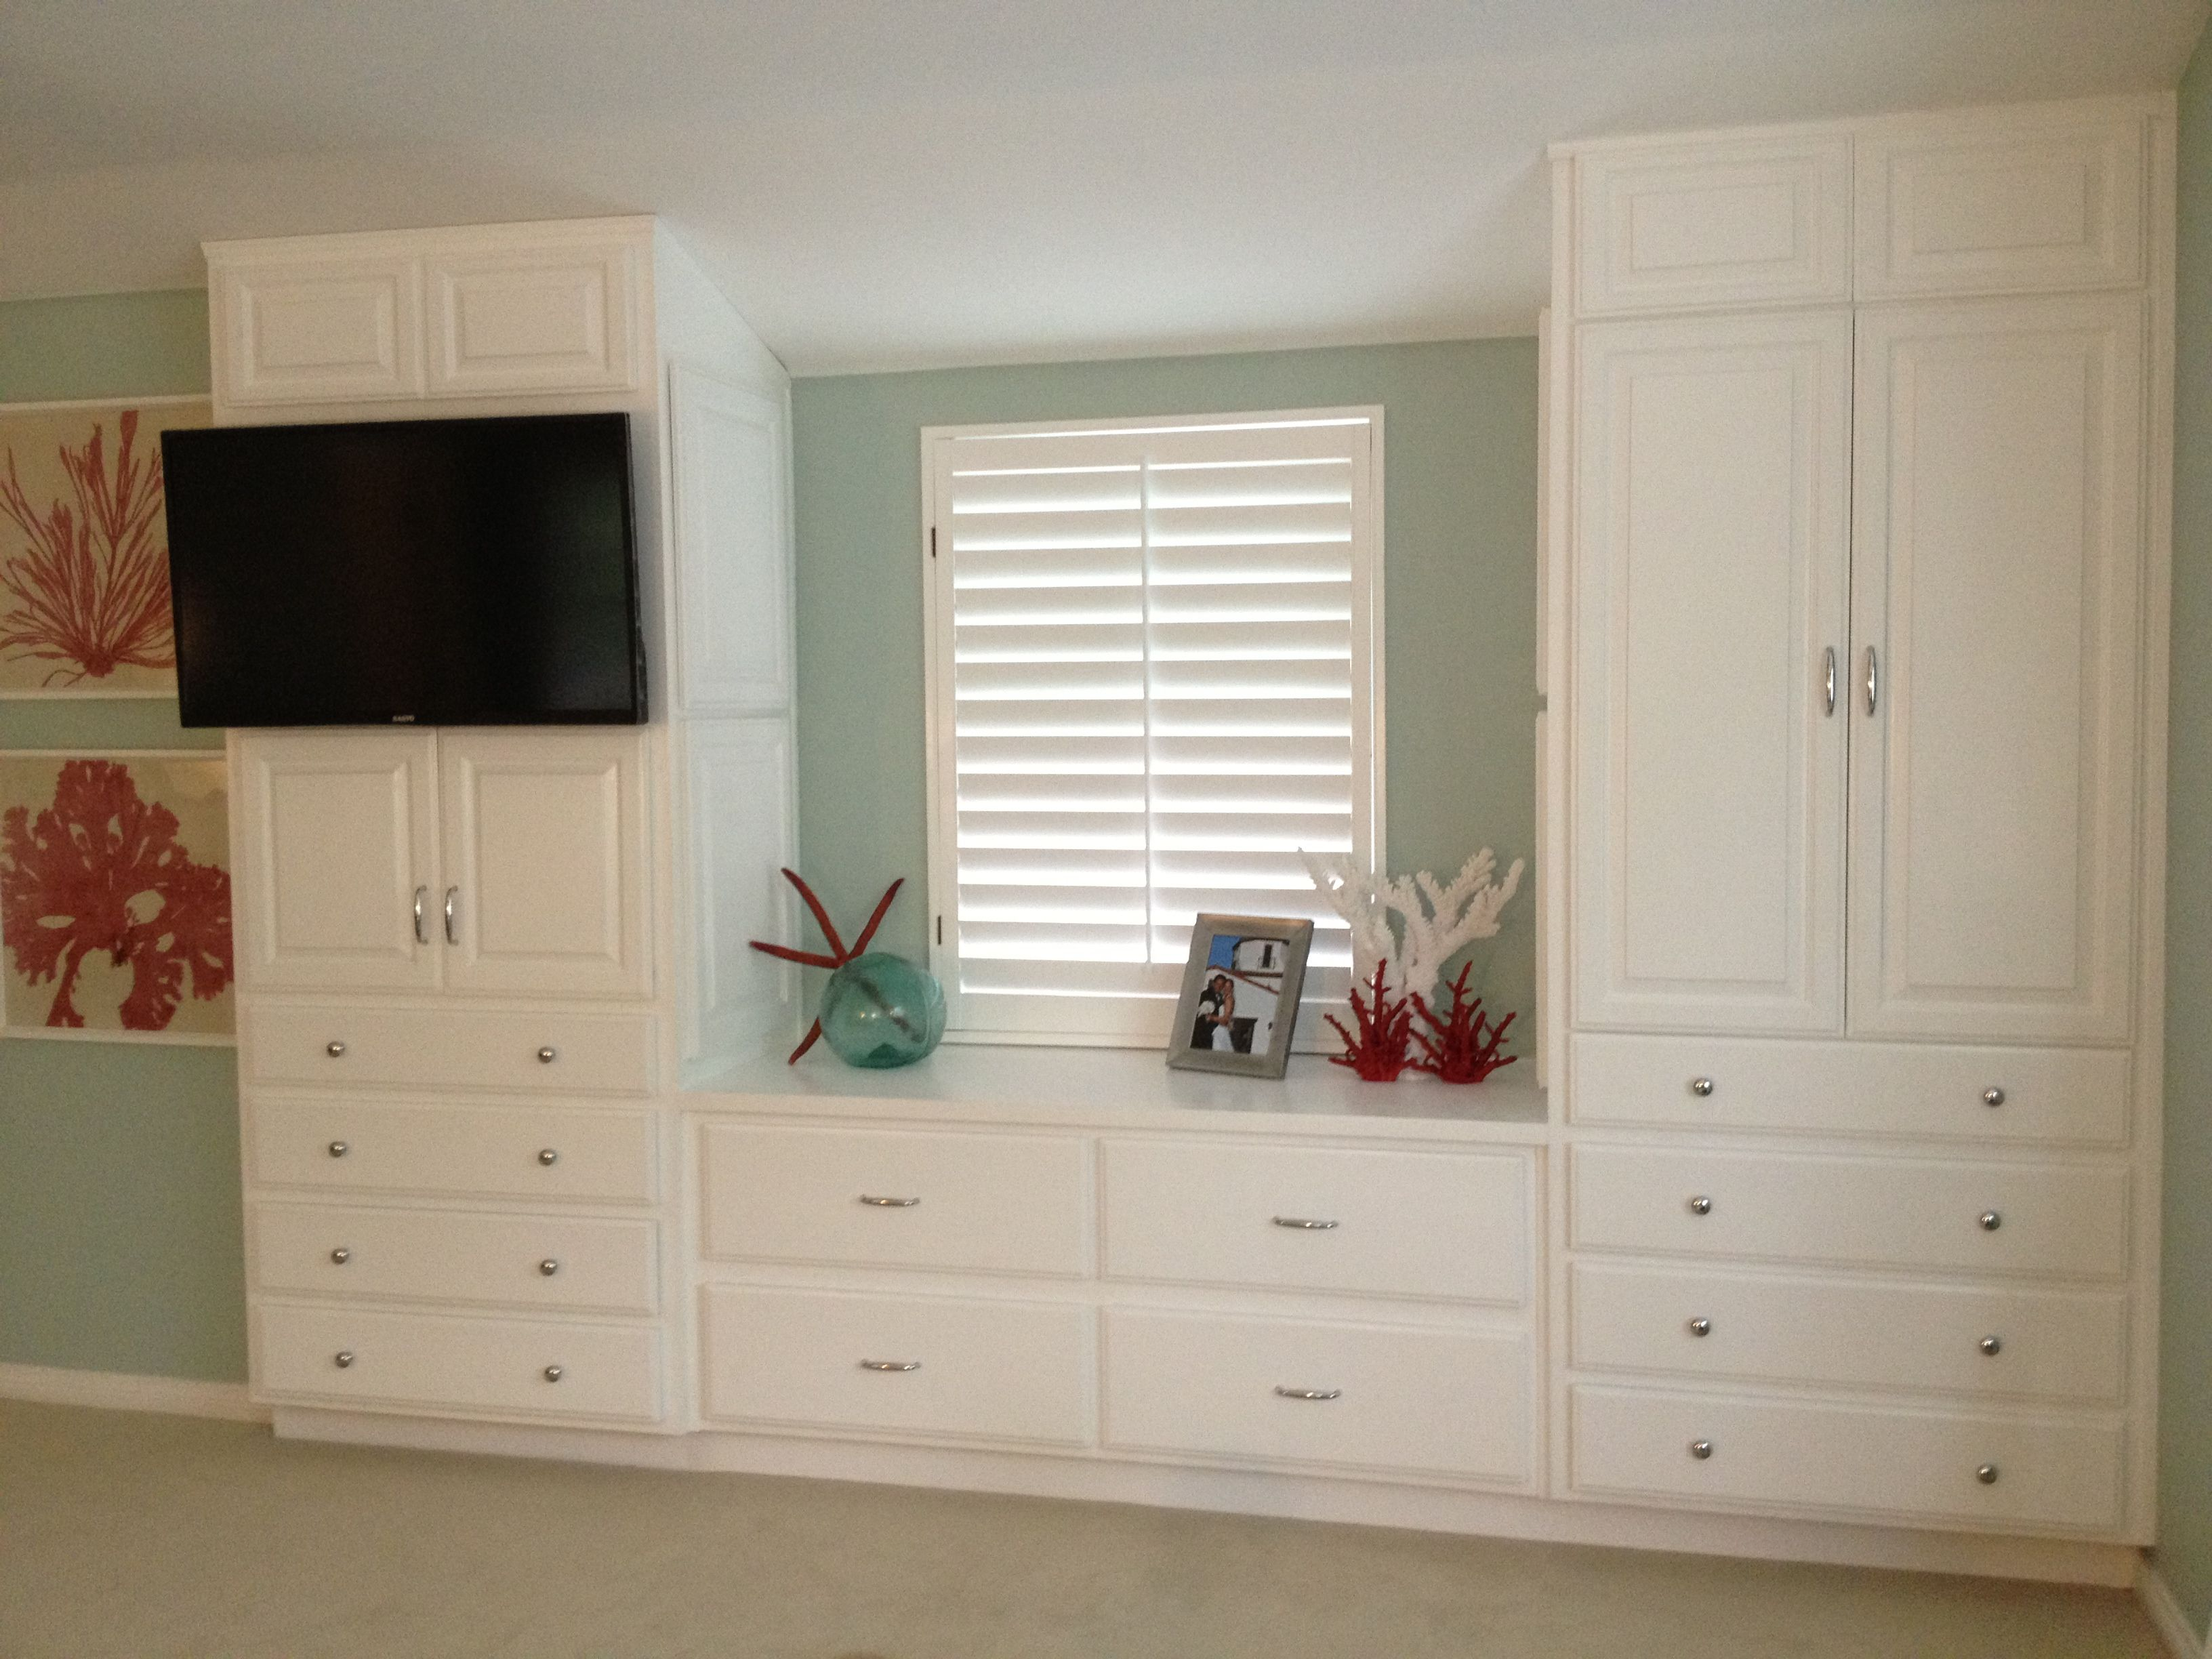 Master bedroom Built in cabinet plete Palladian blue and